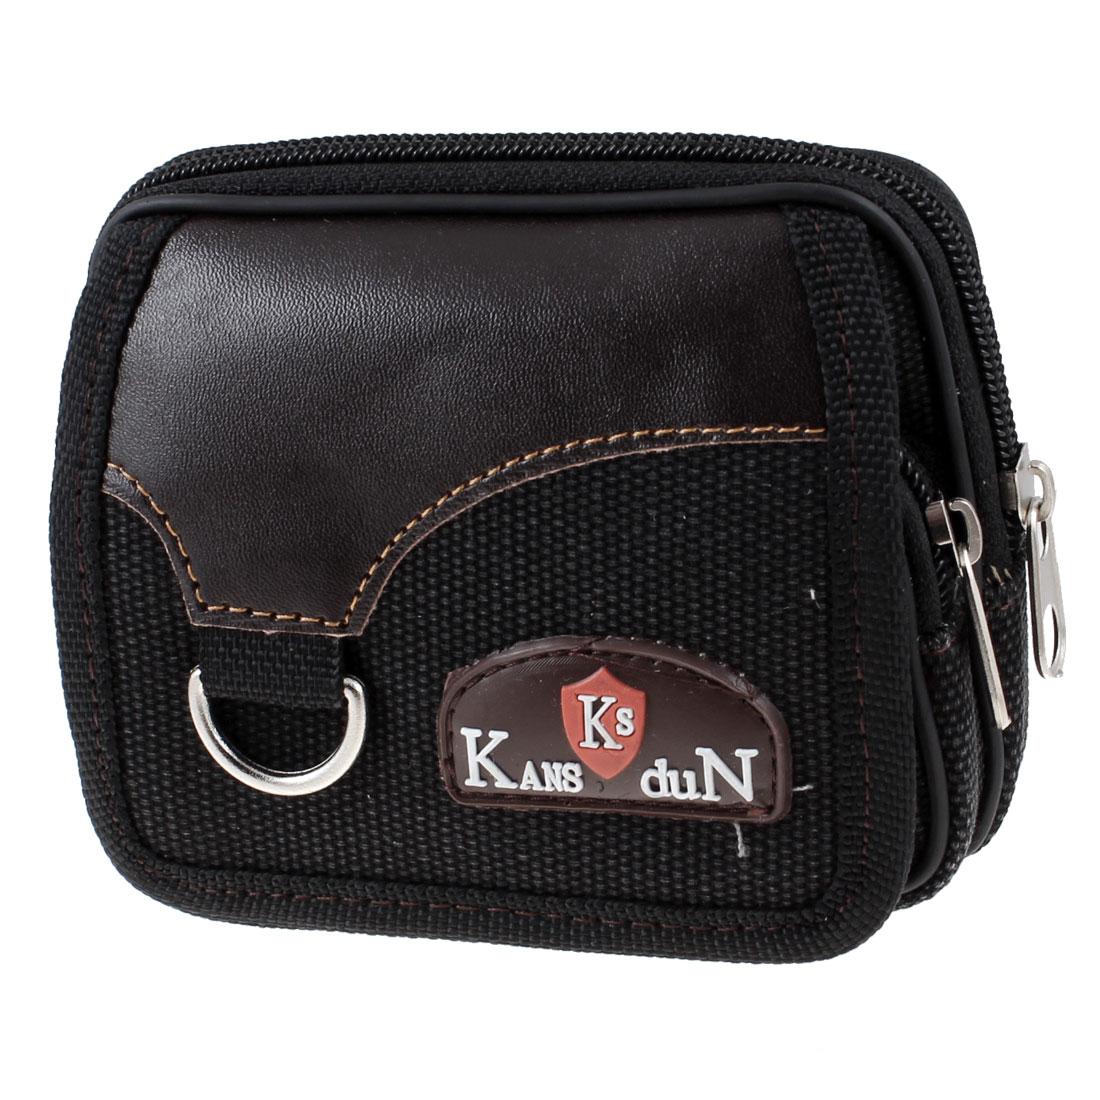 Zipper Closure Digital Camera Container Belt Bag Waist Pack Black